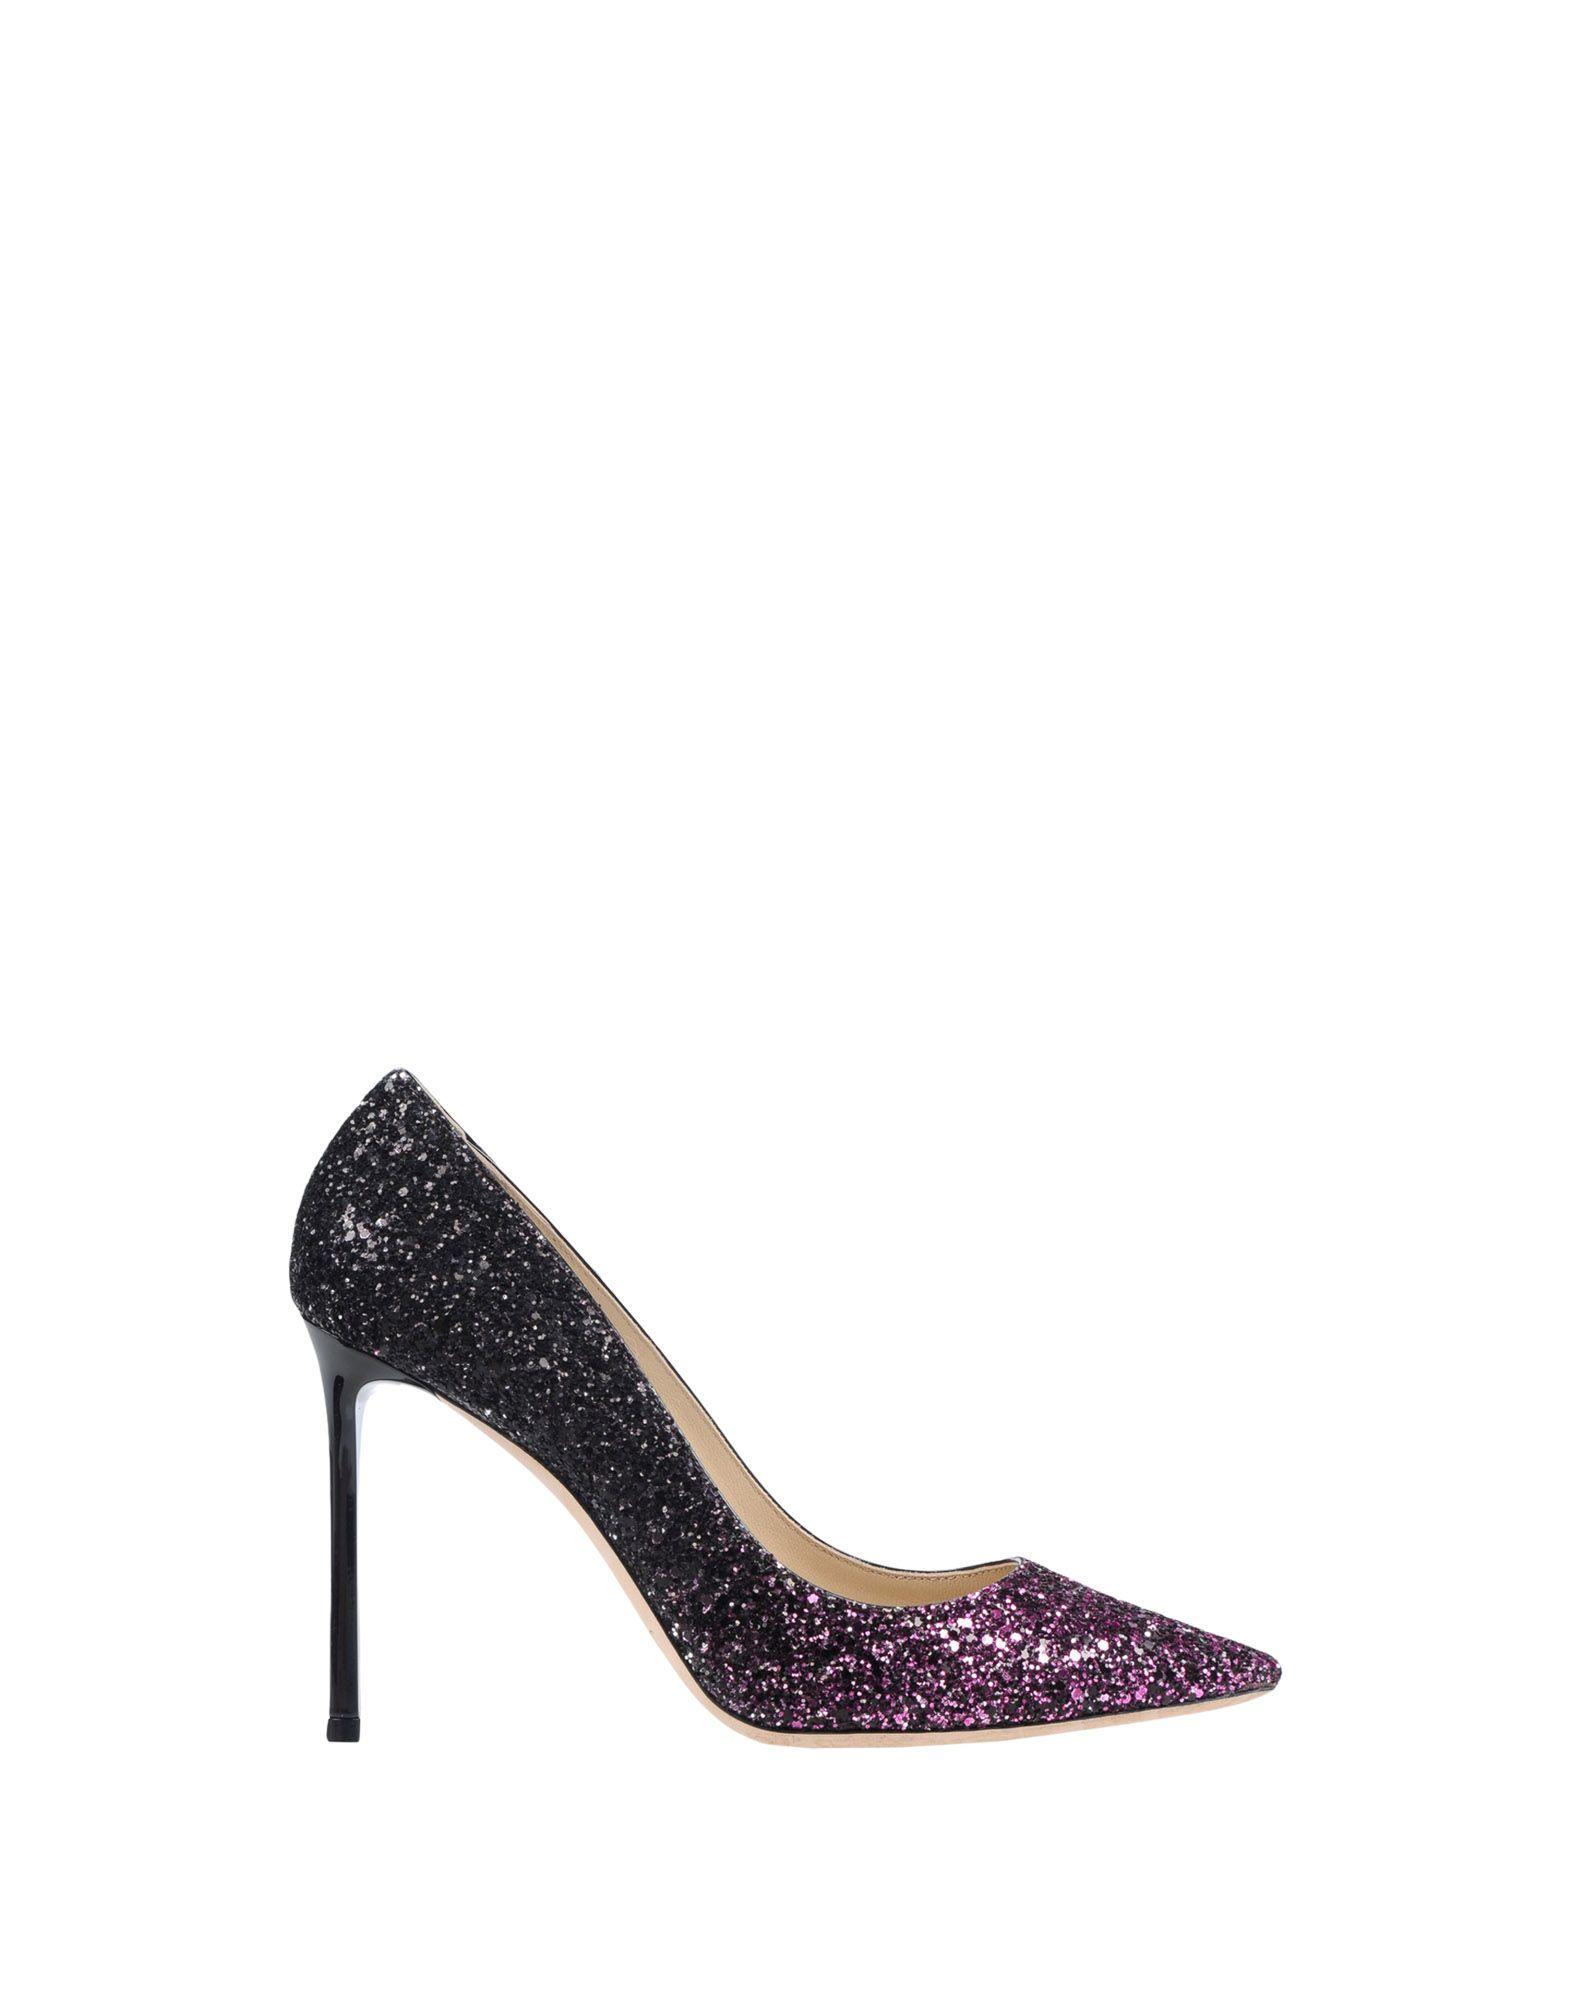 Jimmy Choo Pumps aussehende Damen  11509619OQGünstige gut aussehende Pumps Schuhe 3355fe